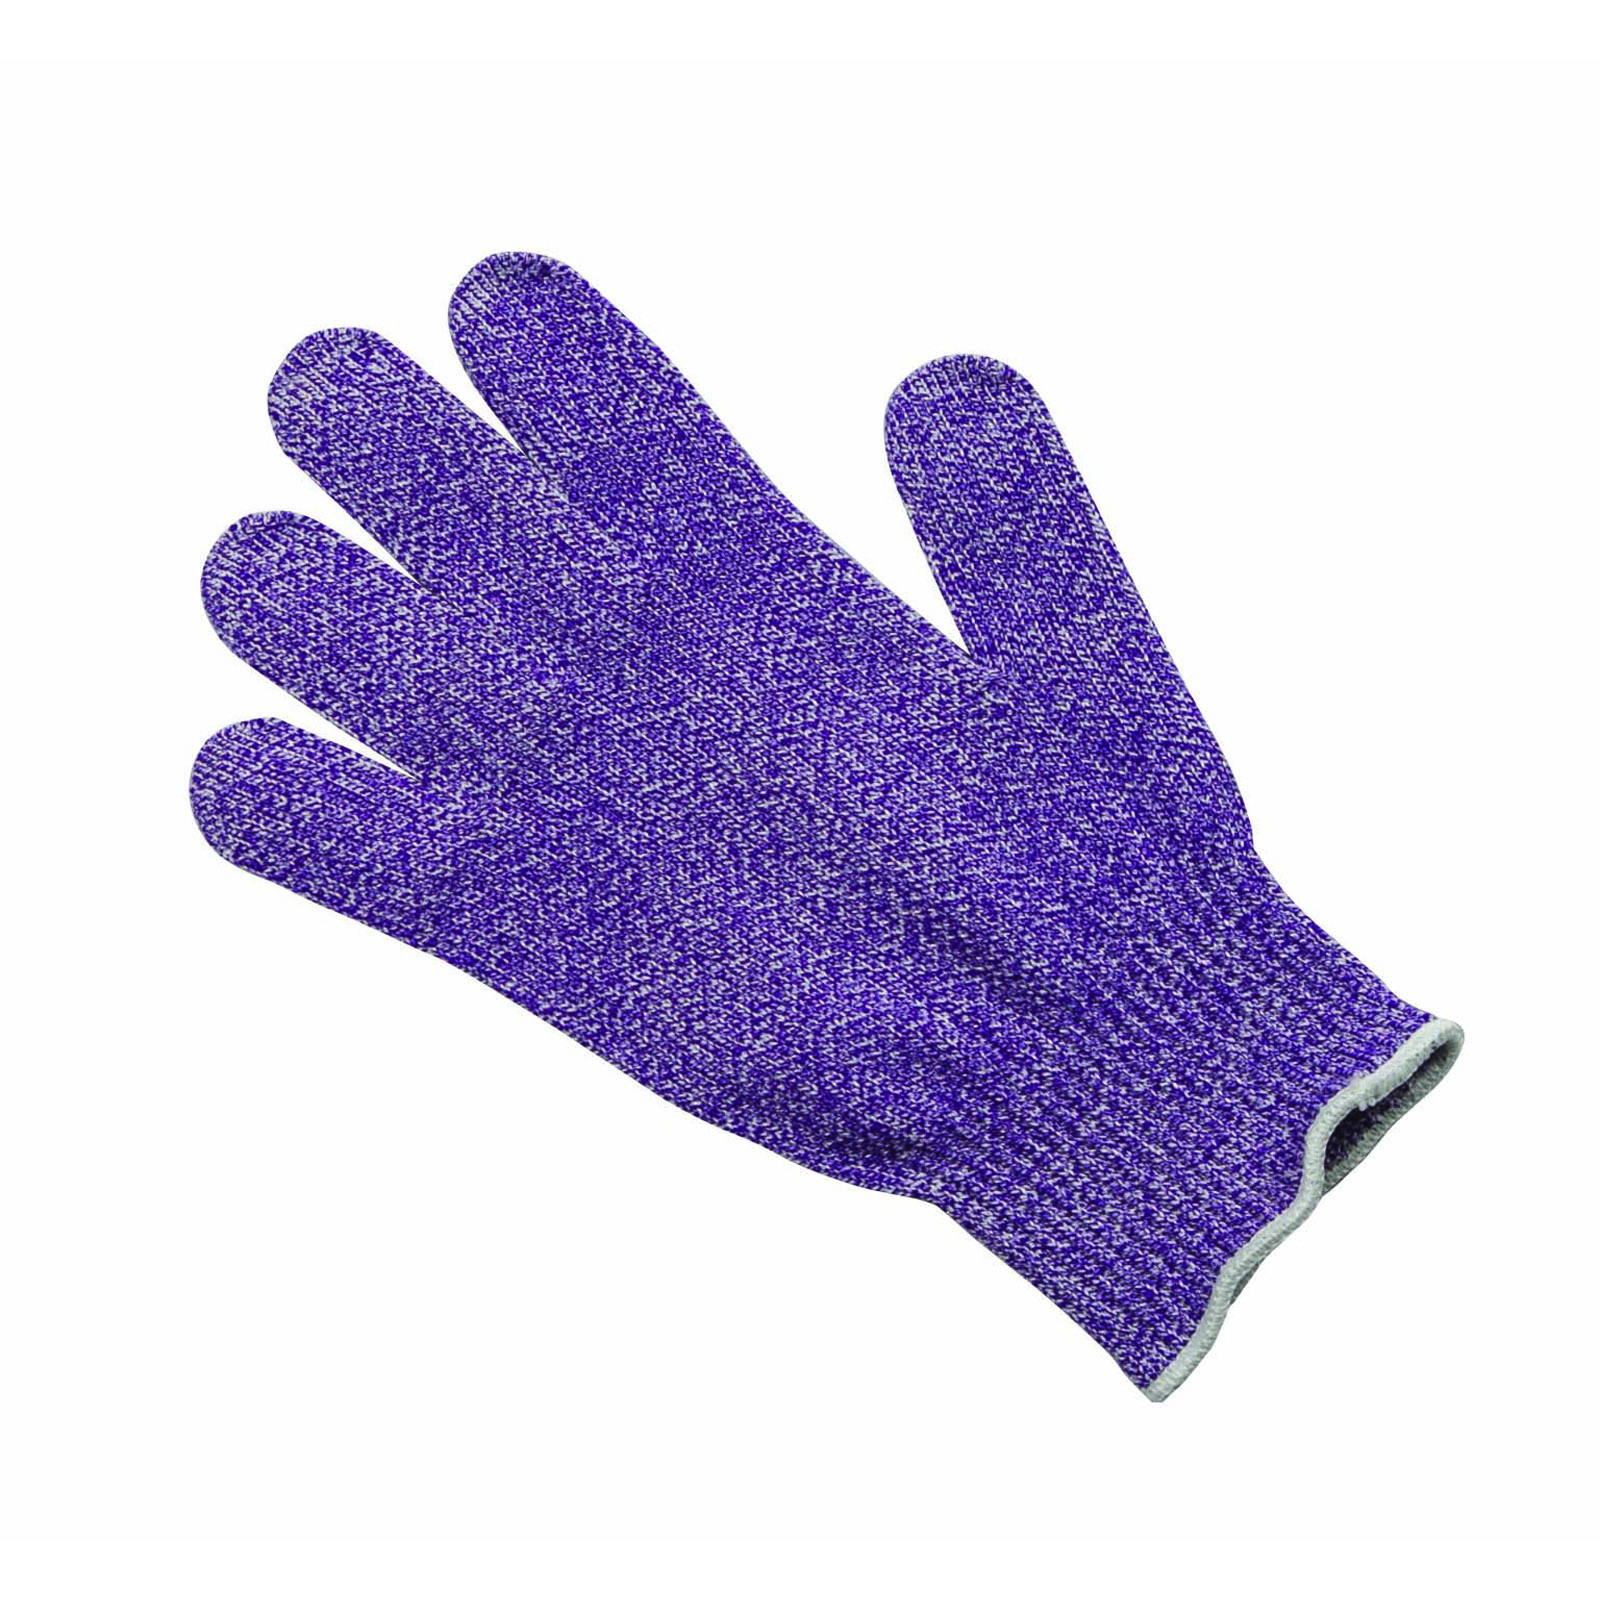 San Jamar SG10-PR-M glove, cut resistant